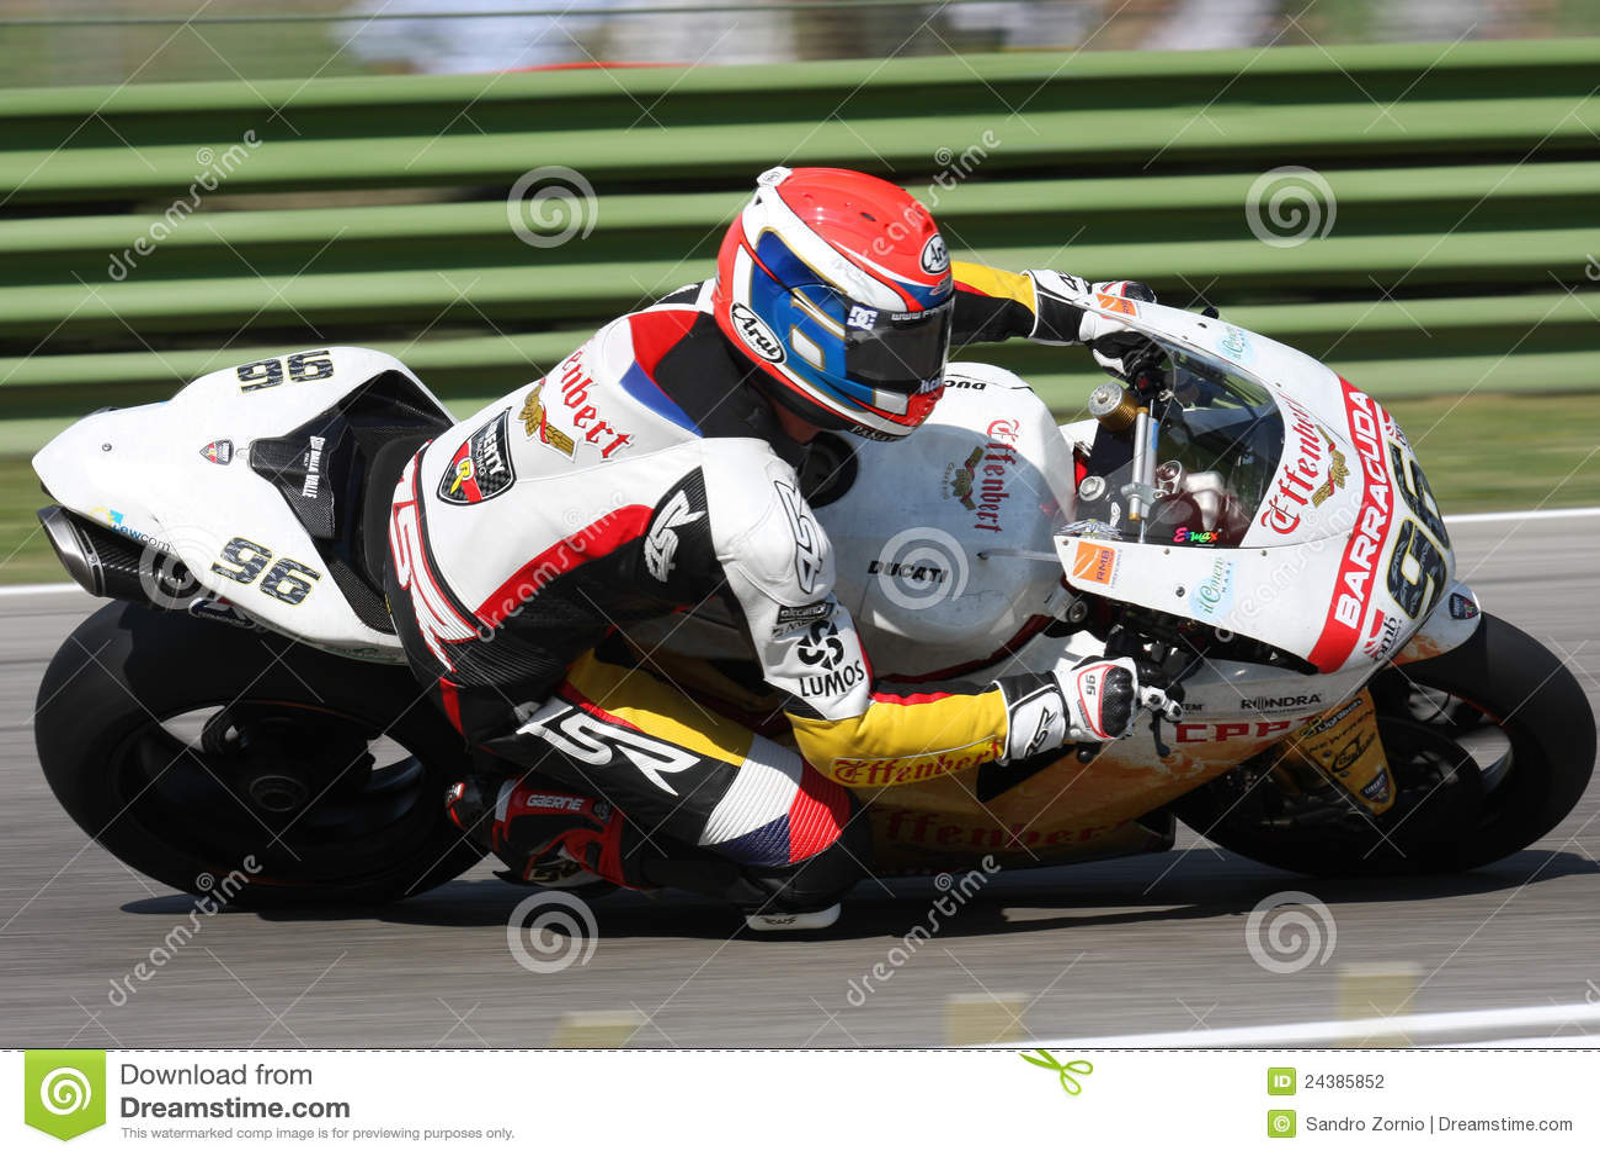 Jakub Smrz - Ducati 1098R - Team Effenbert Liberty